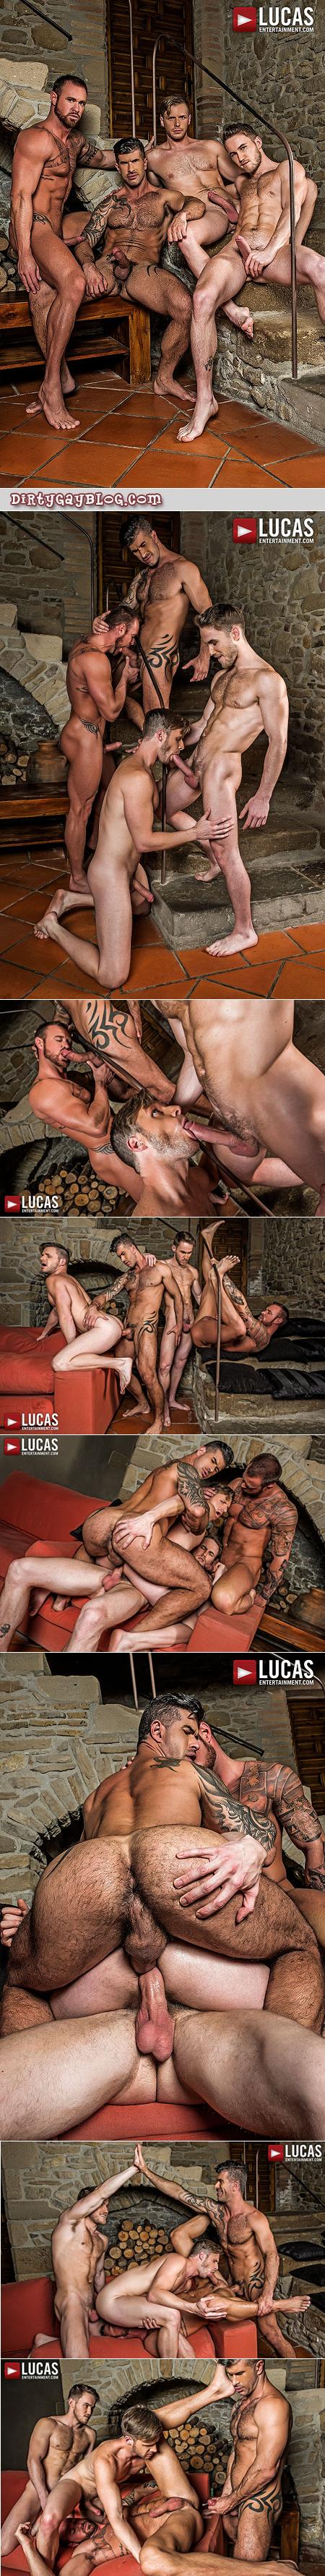 Muscular tattooed men having gay bareback group sex together.